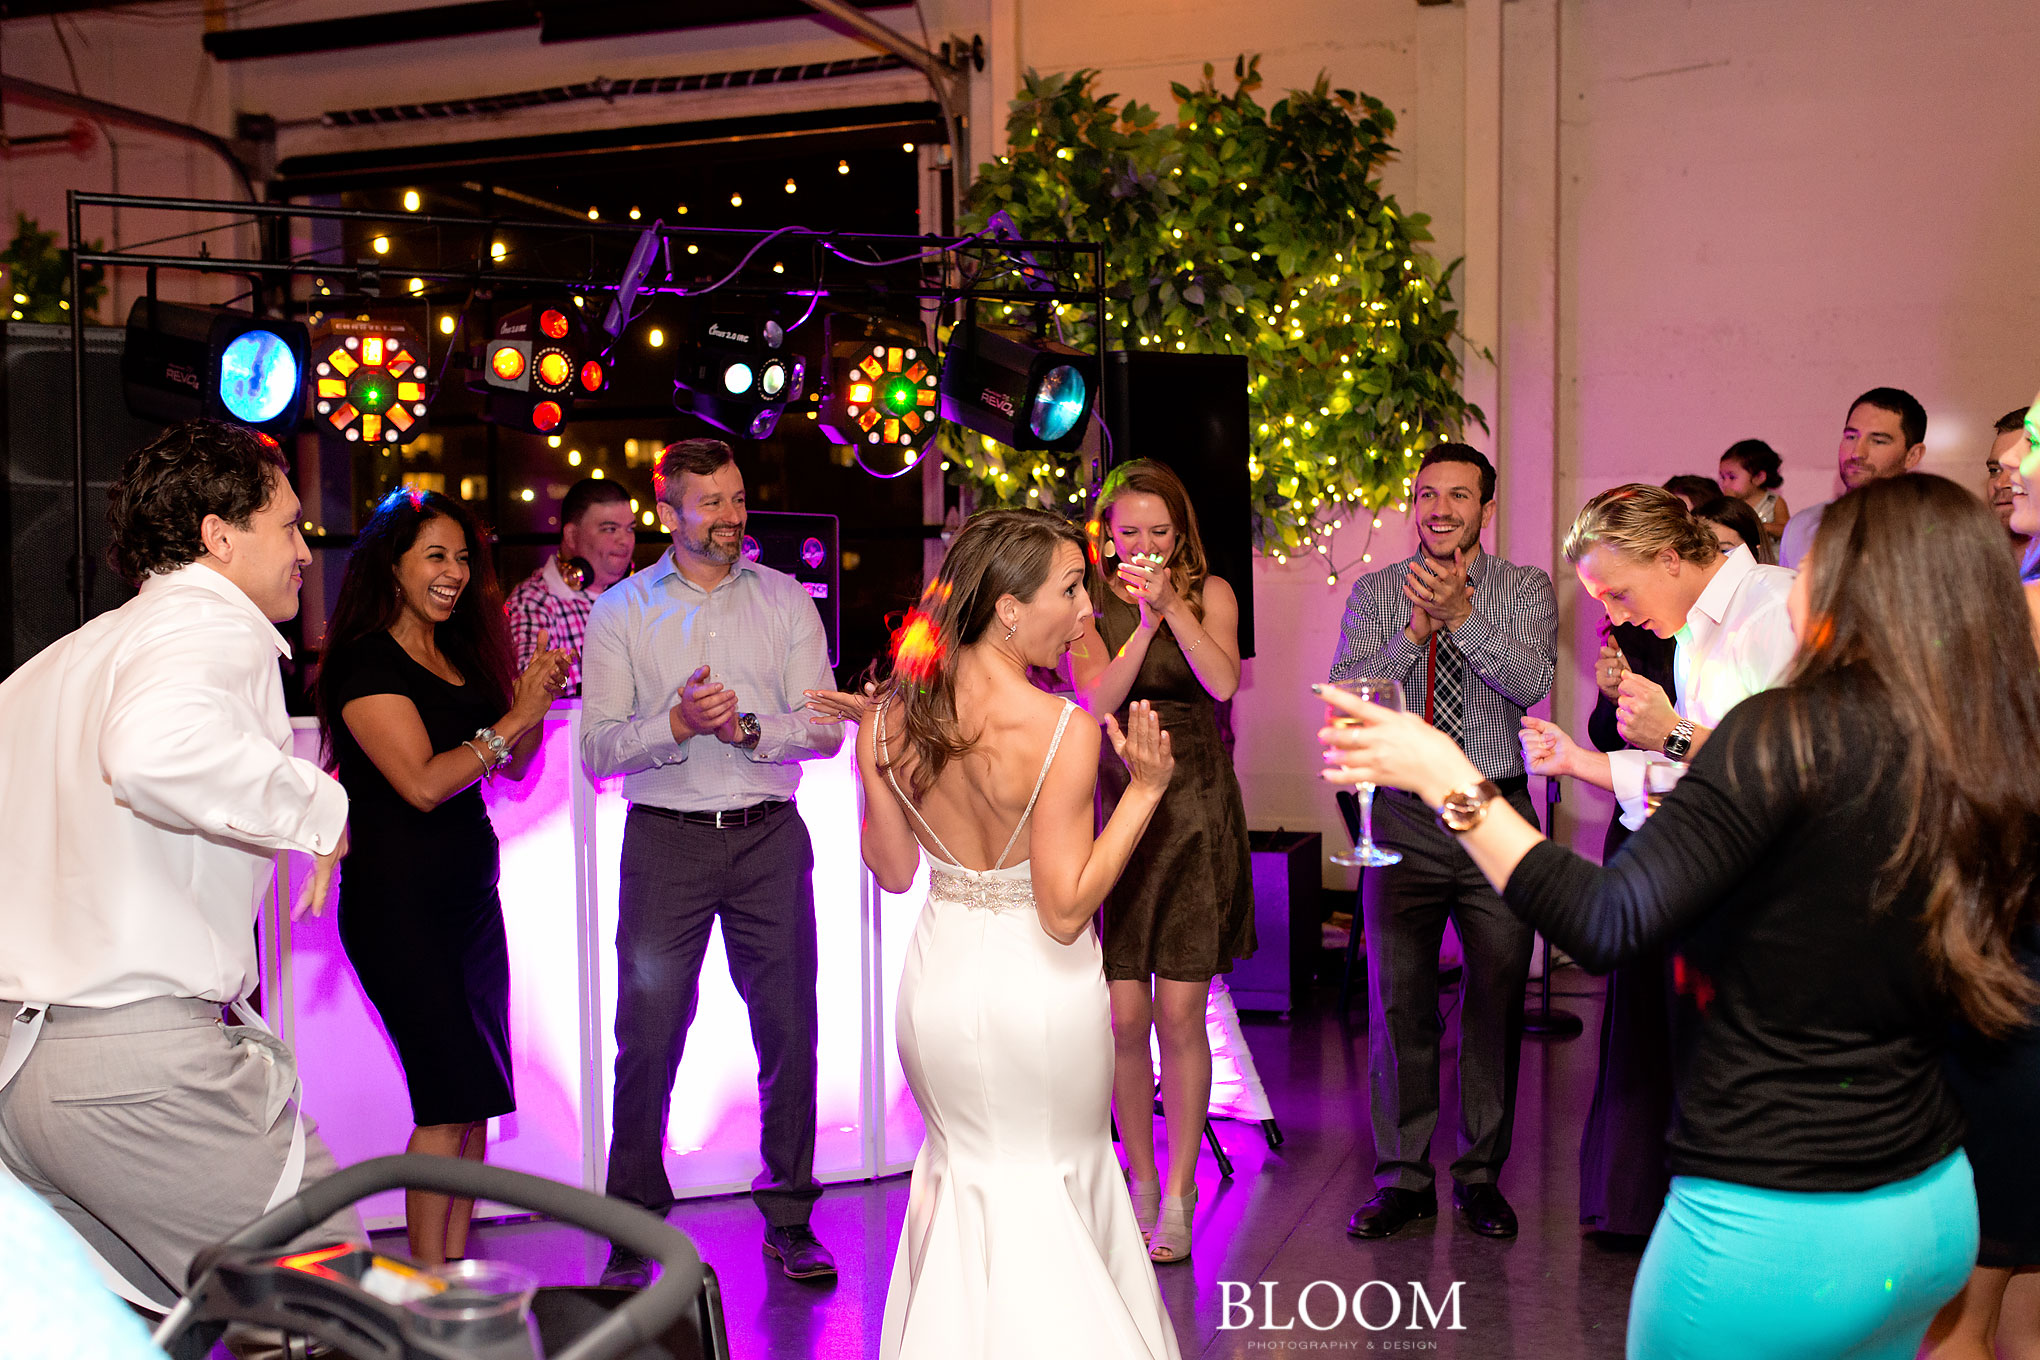 portland_oregon_wedding_photographer_san_antonio_texas_bloom_231016_NMM_7497.jpg